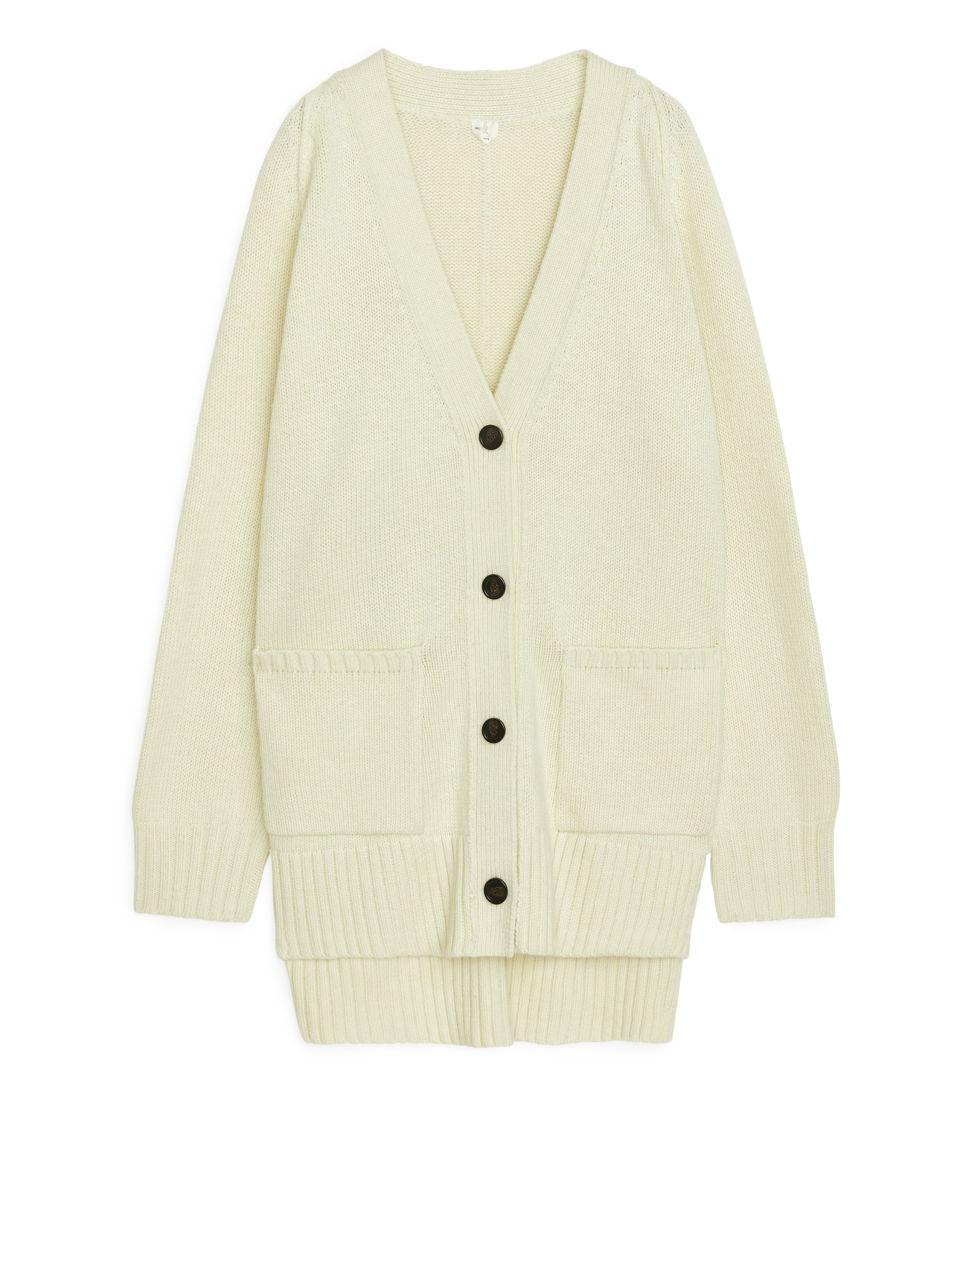 Oversized Wool Cardigan - Yellow